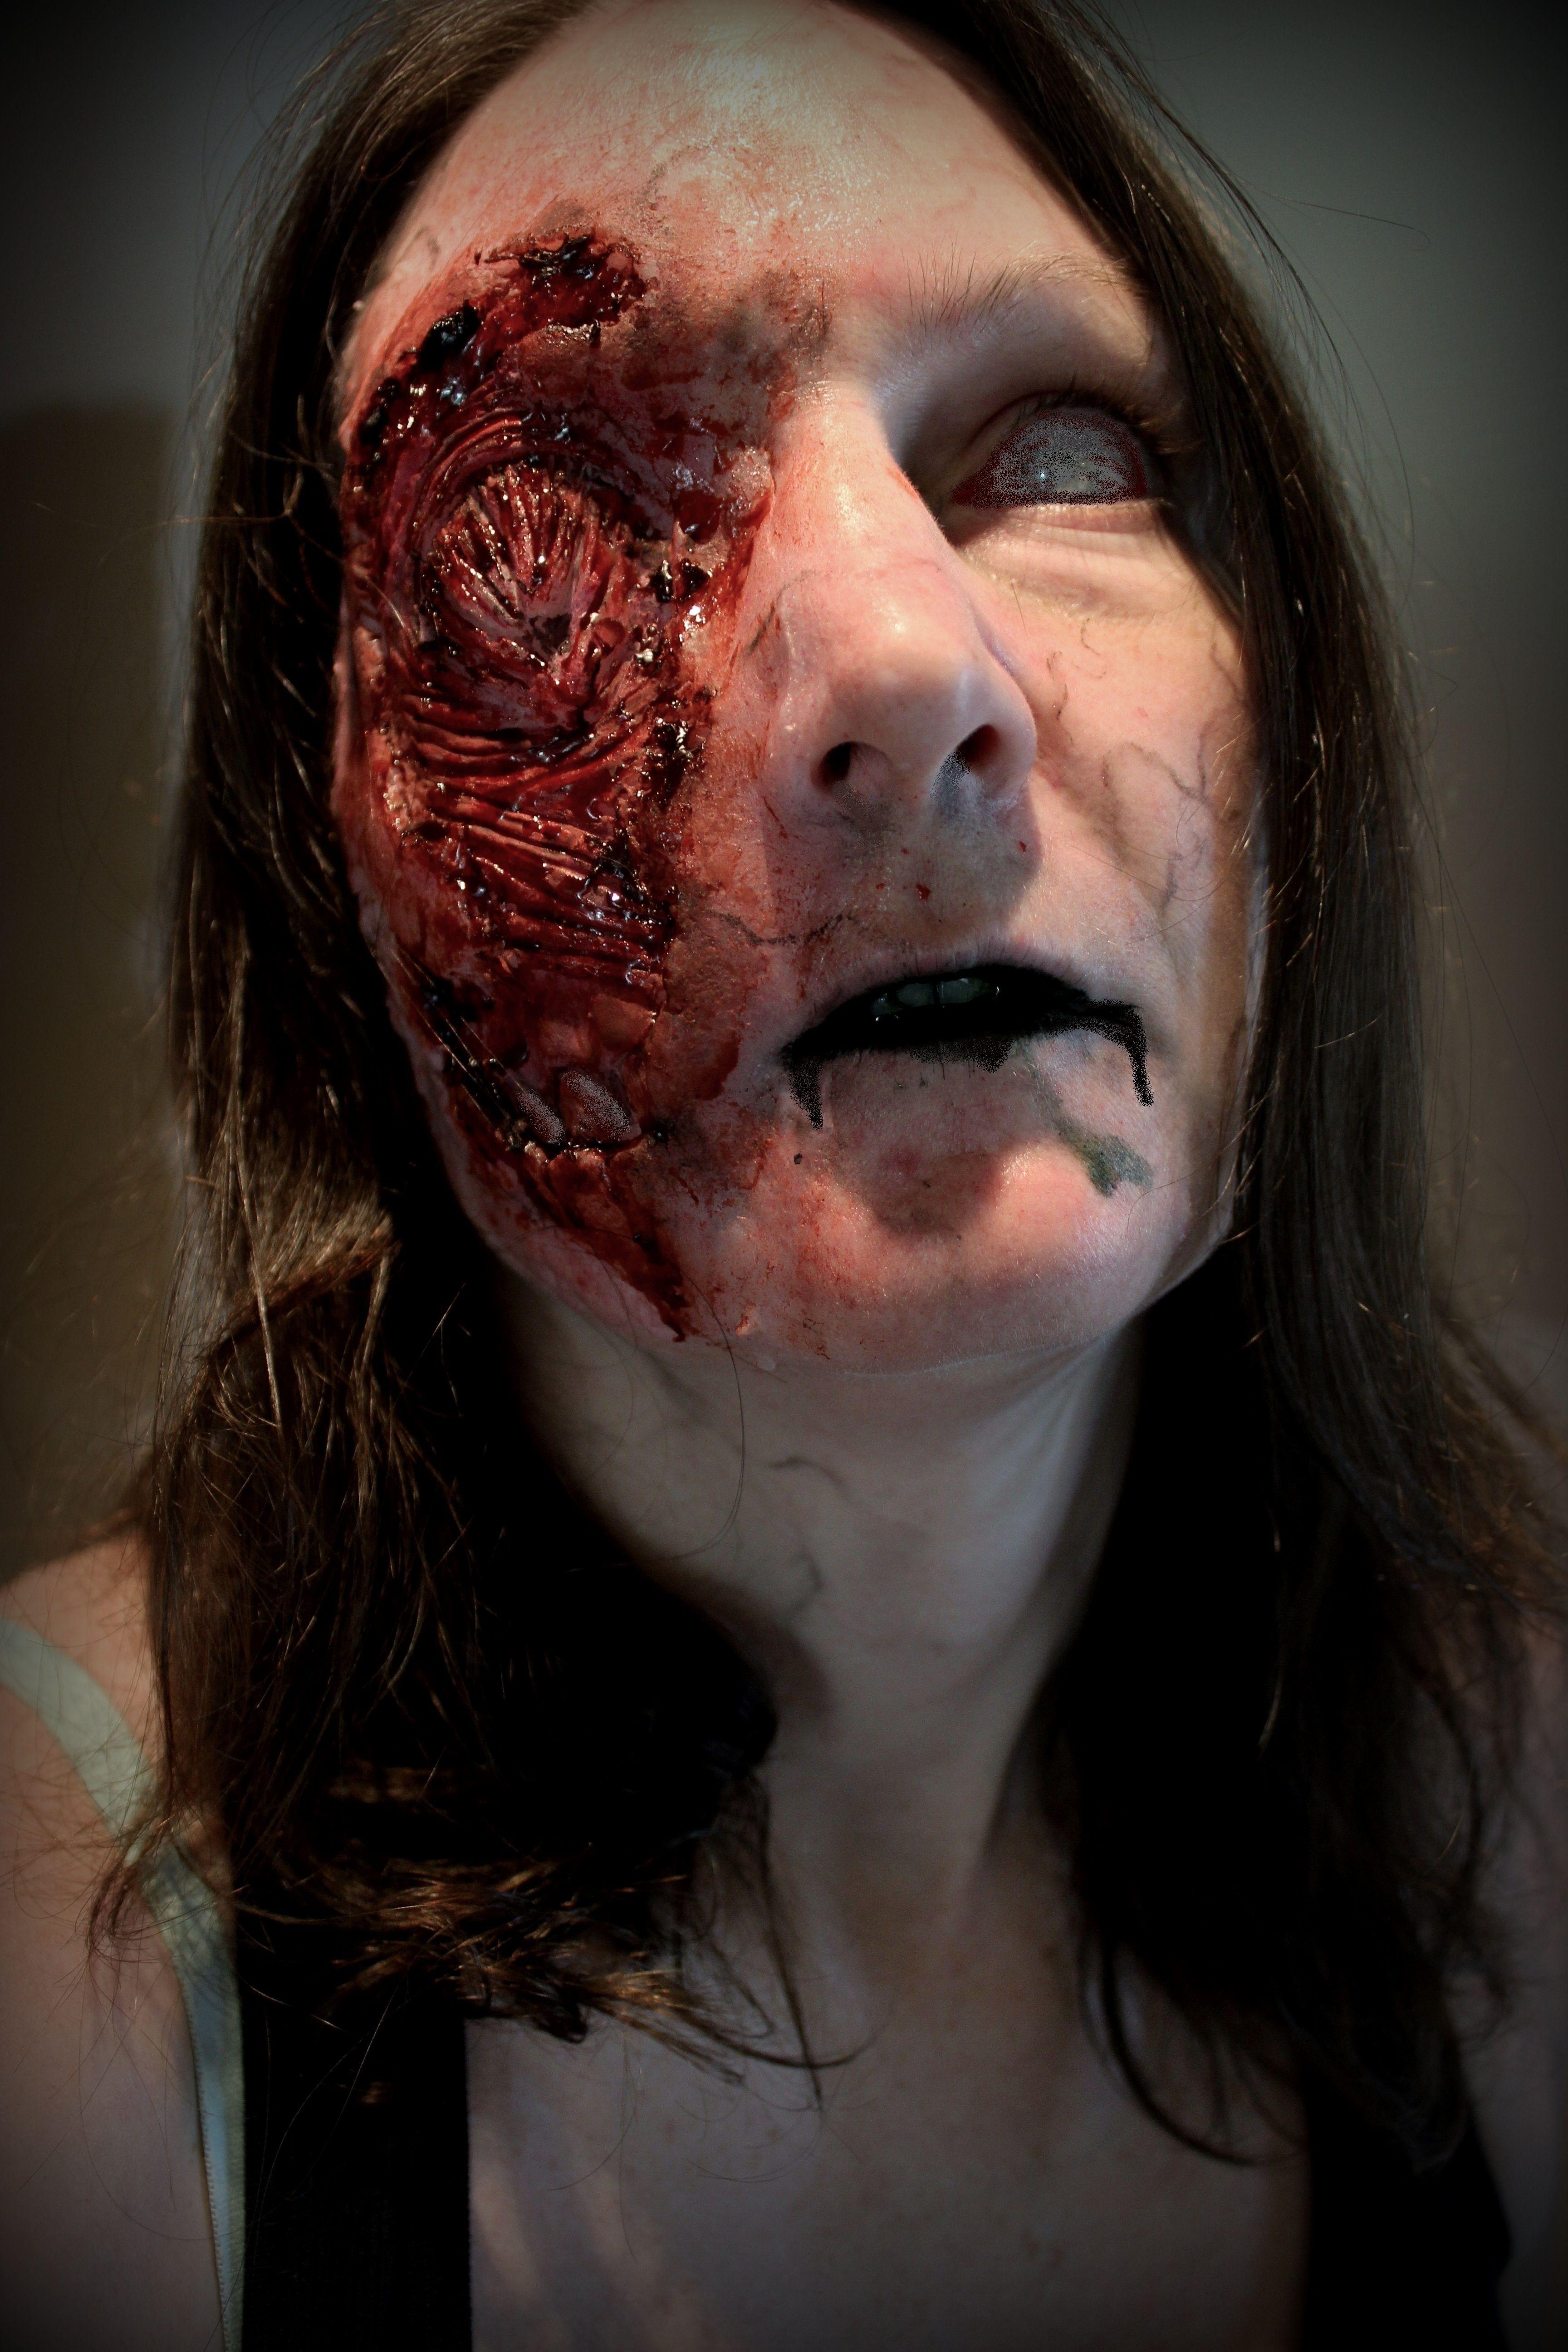 Torn face prosthetic